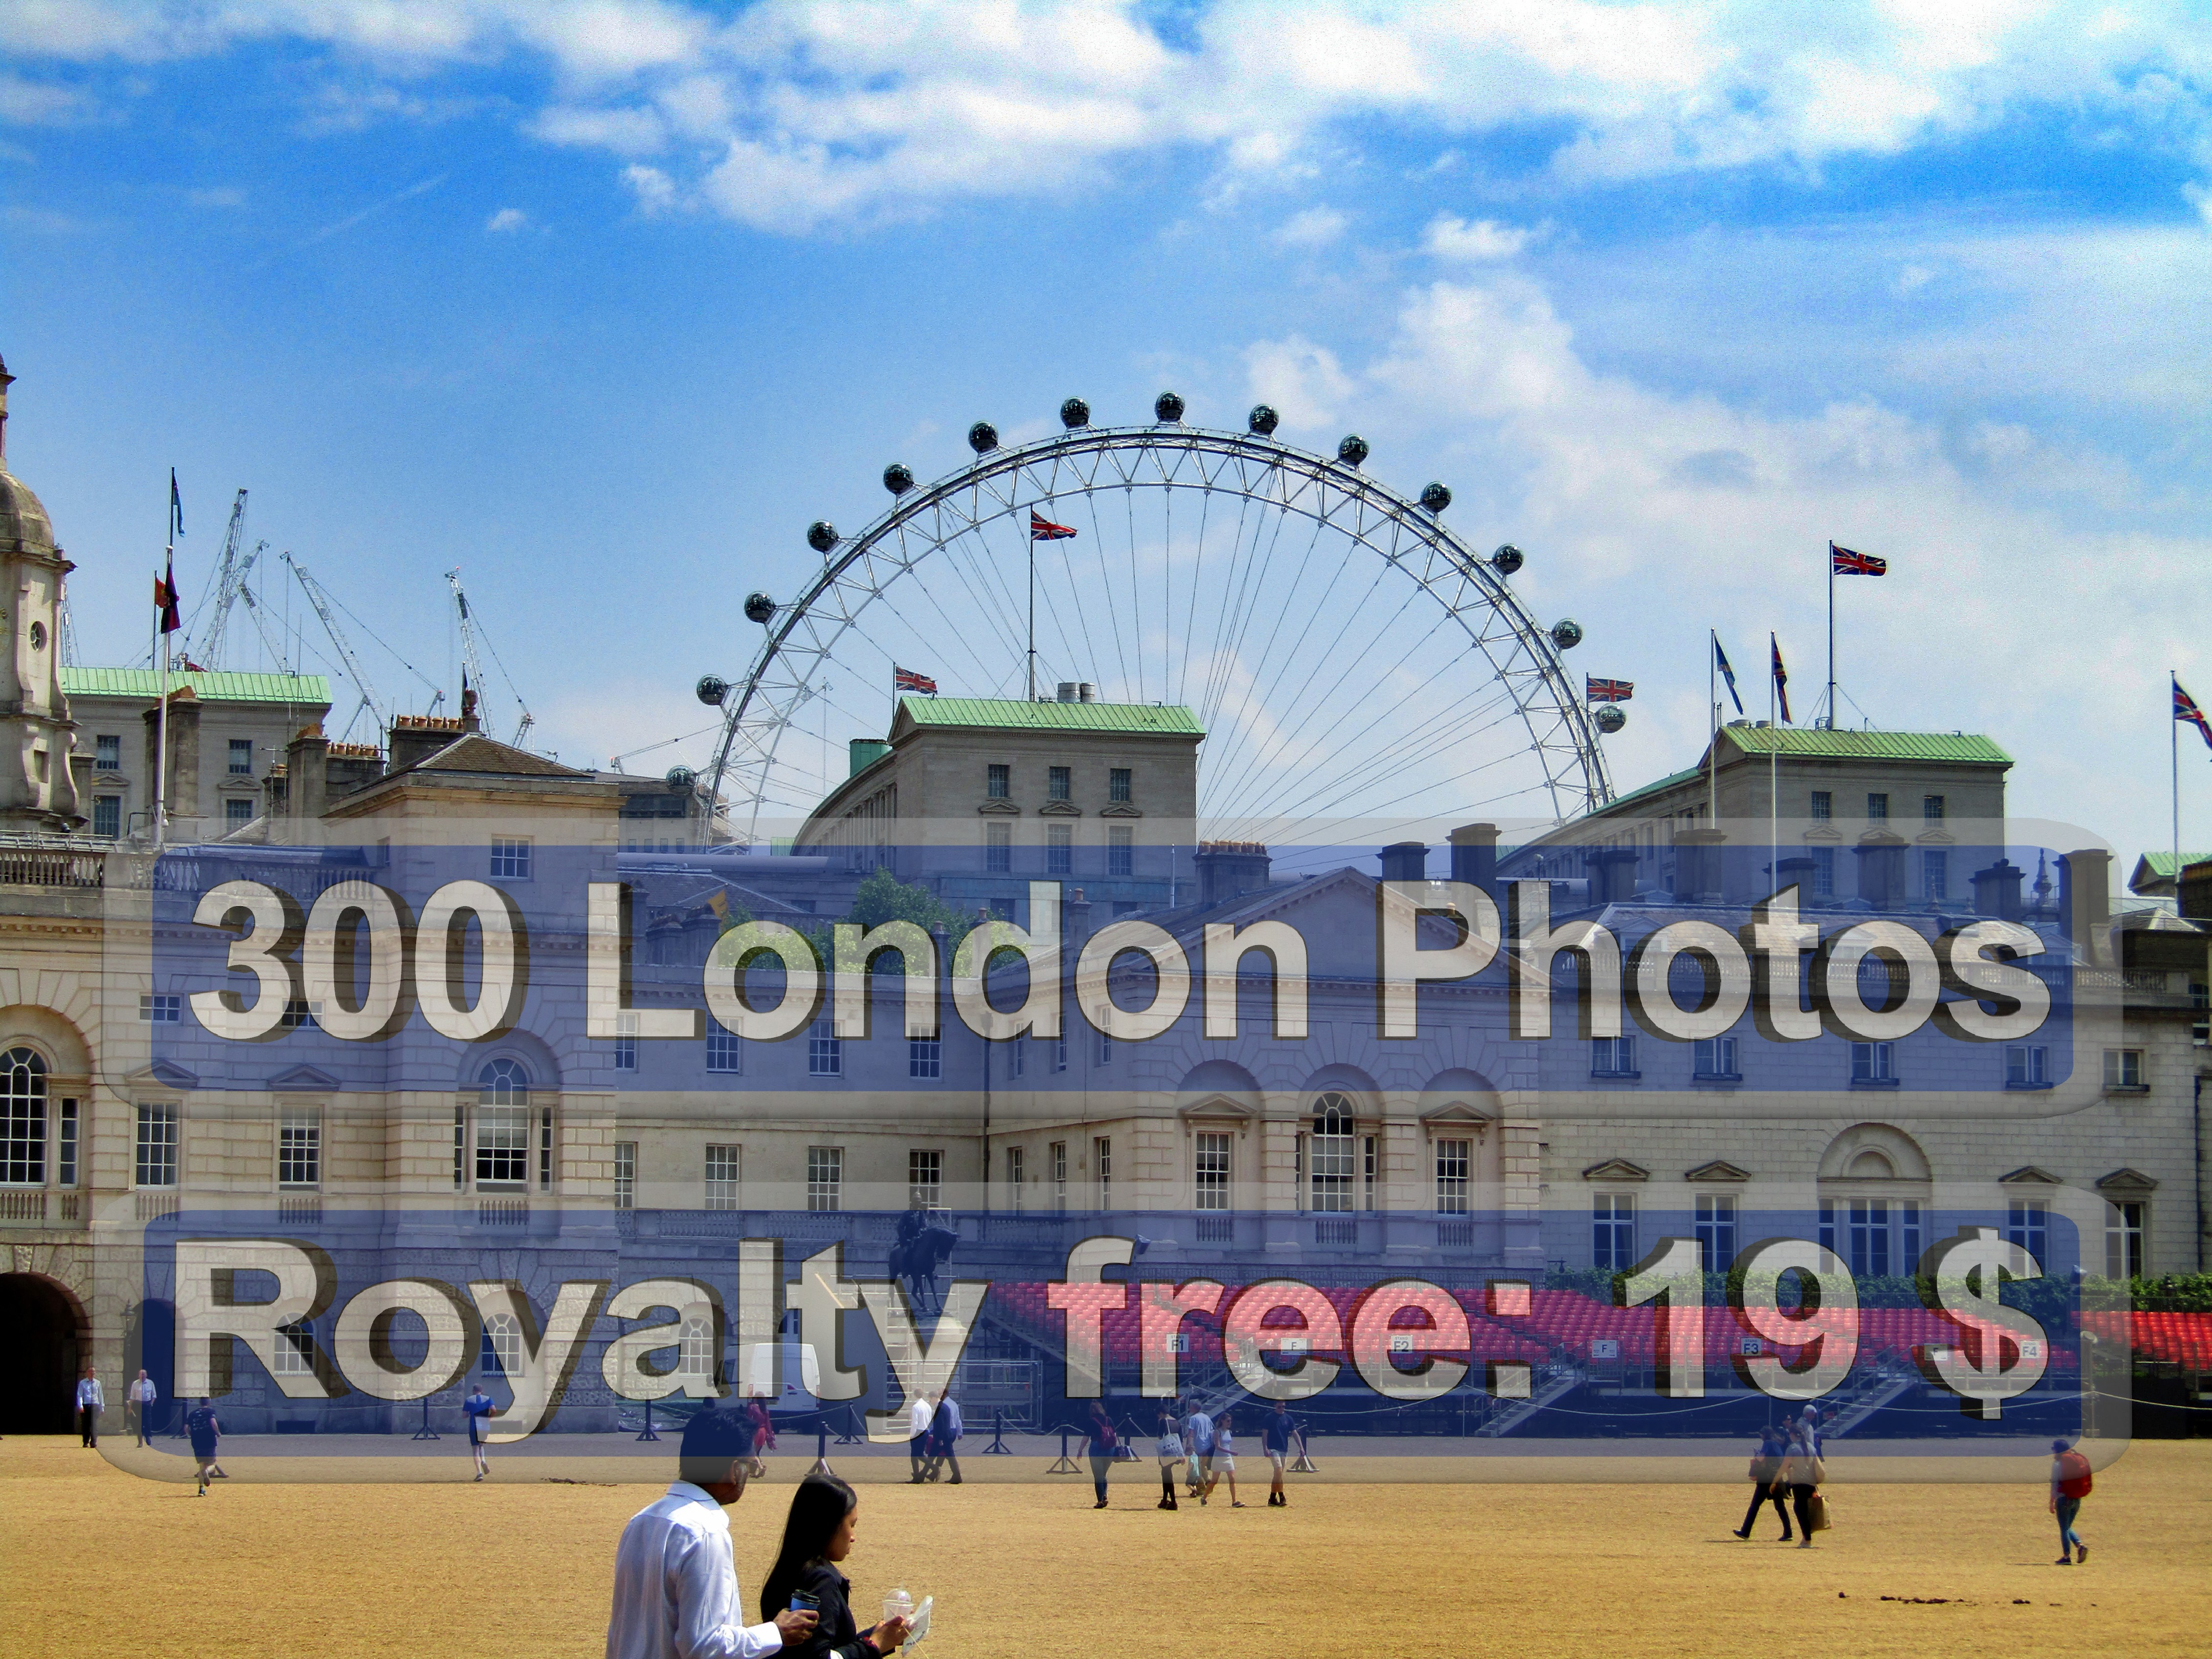 London Photo Festival 2017